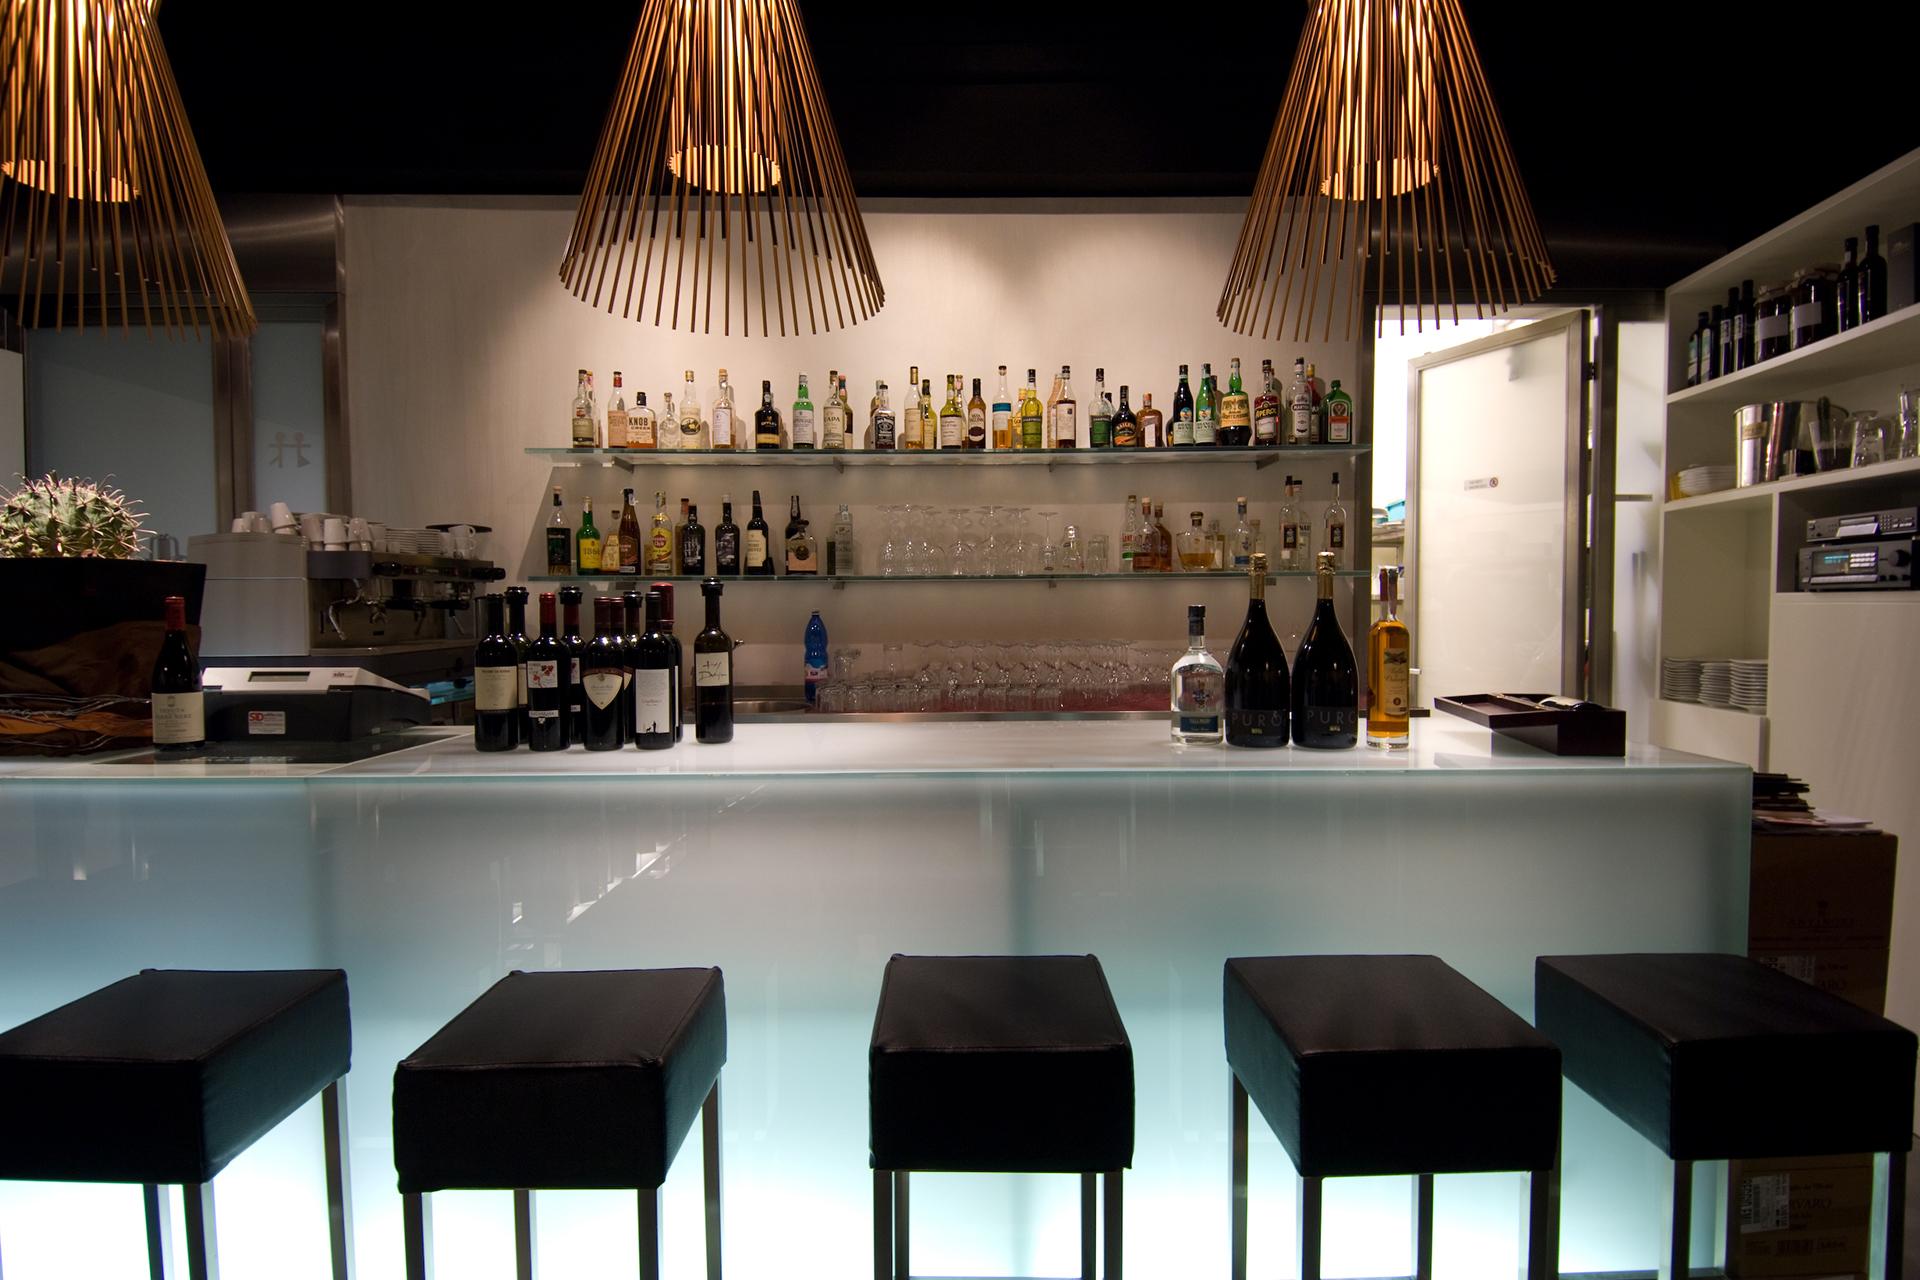 Enoteca ristorante canale maestro reggio emilia 2007 for Restaurant reggio emilia